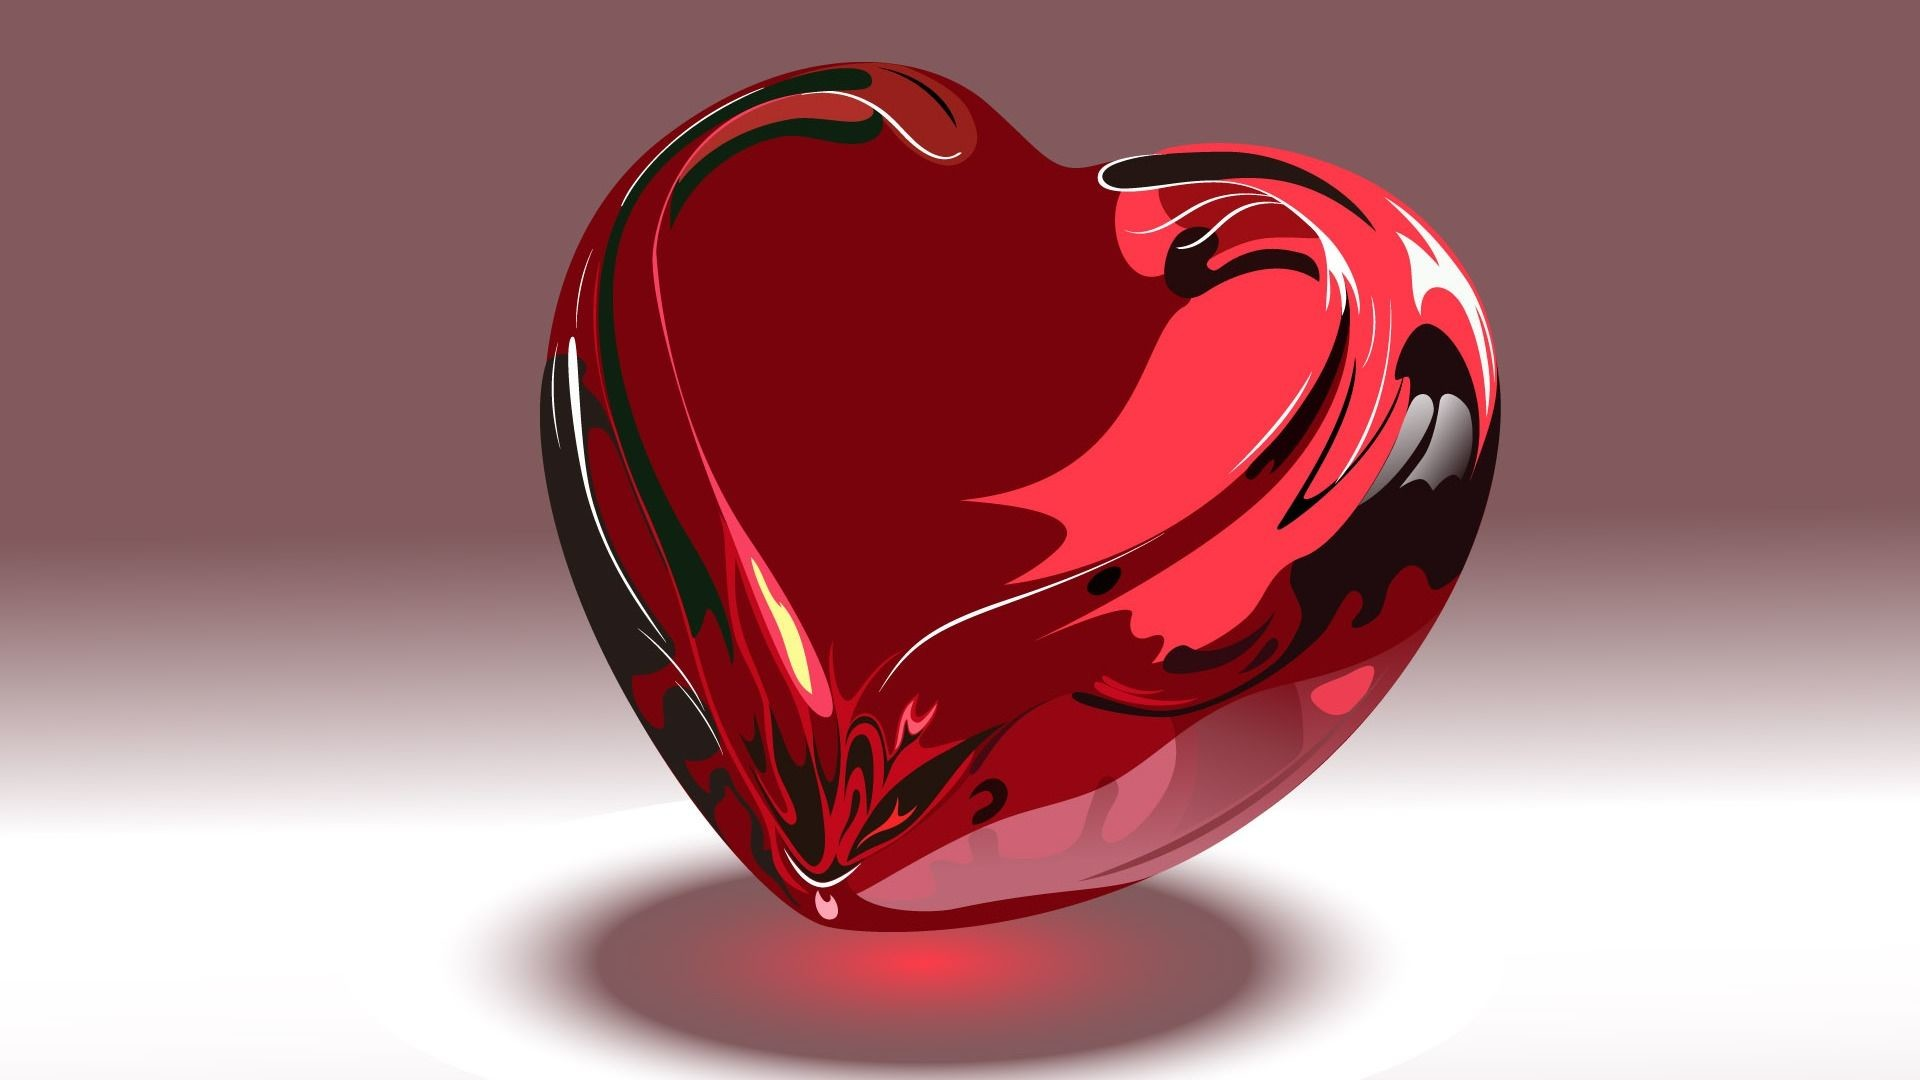 Heart Wallpaper D Name Photo